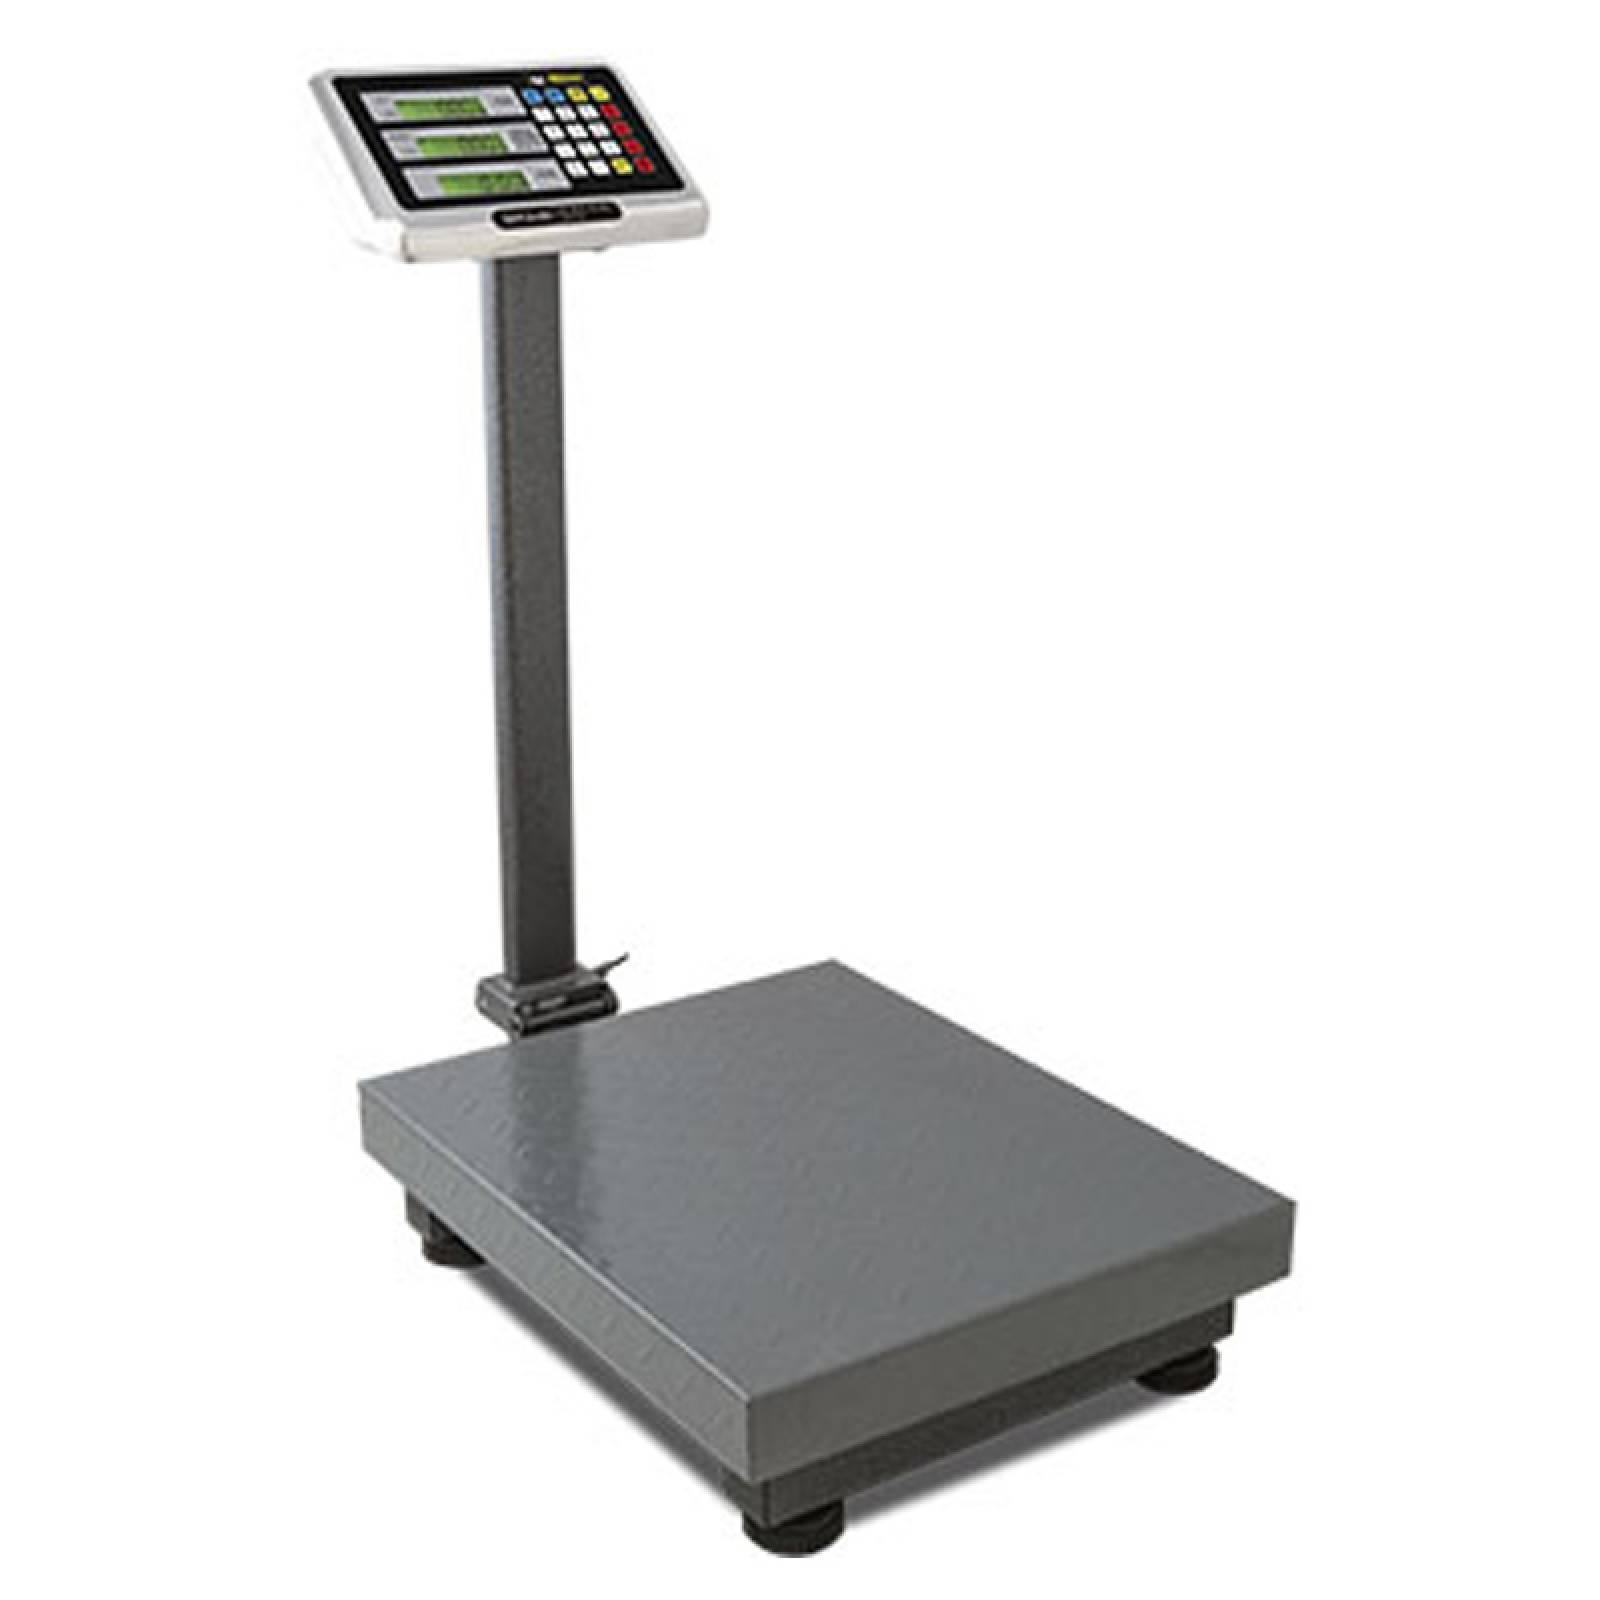 Bascula Digital Plataforma 100Kg/10G Acero Al Carbono Rhino